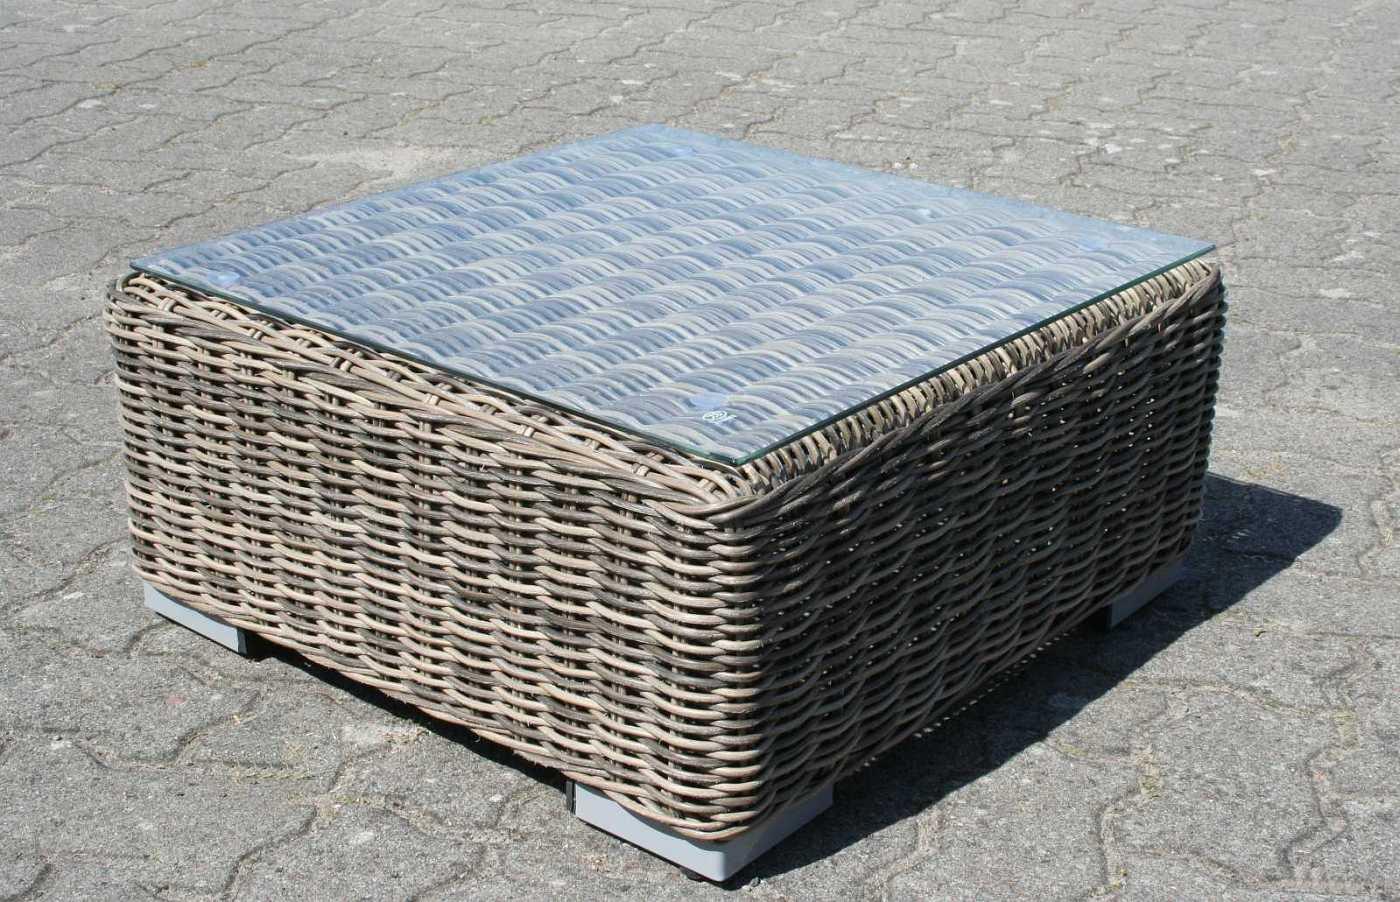 Gartenmobel Holz Ikea : Rund Polyrattan Gartenmöbel Poly Rattan Lounge Sitzgruppe